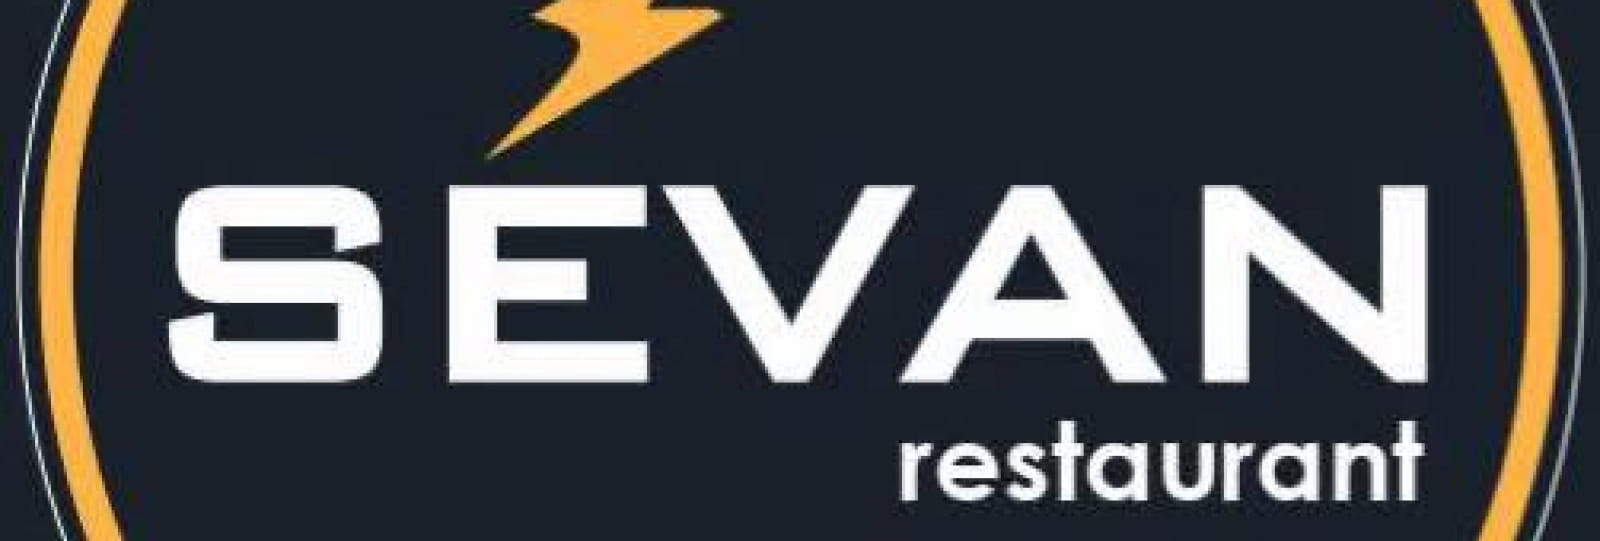 Restaurant Sevan